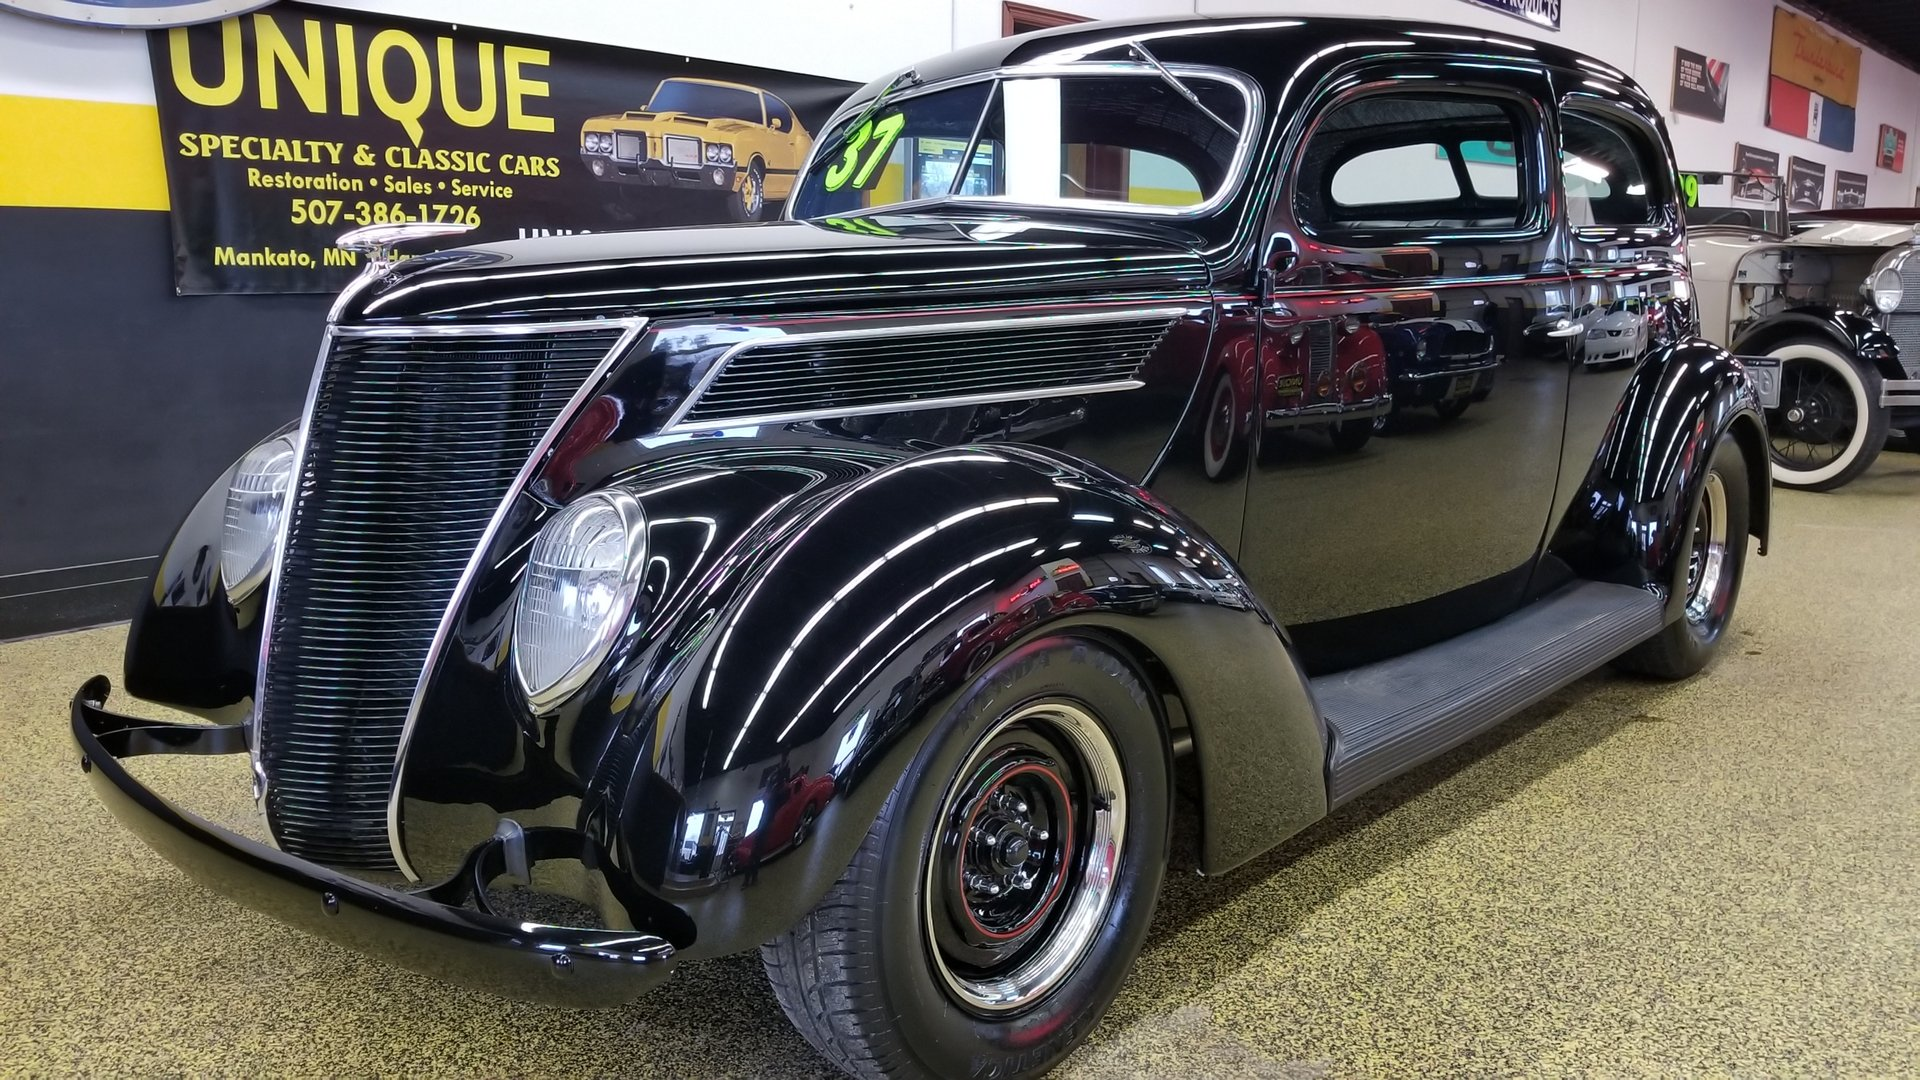 1937 ford sedan slantback ebay 1937 Dodge Sedan 1937 ford sedan slantback unique specialty classic cars